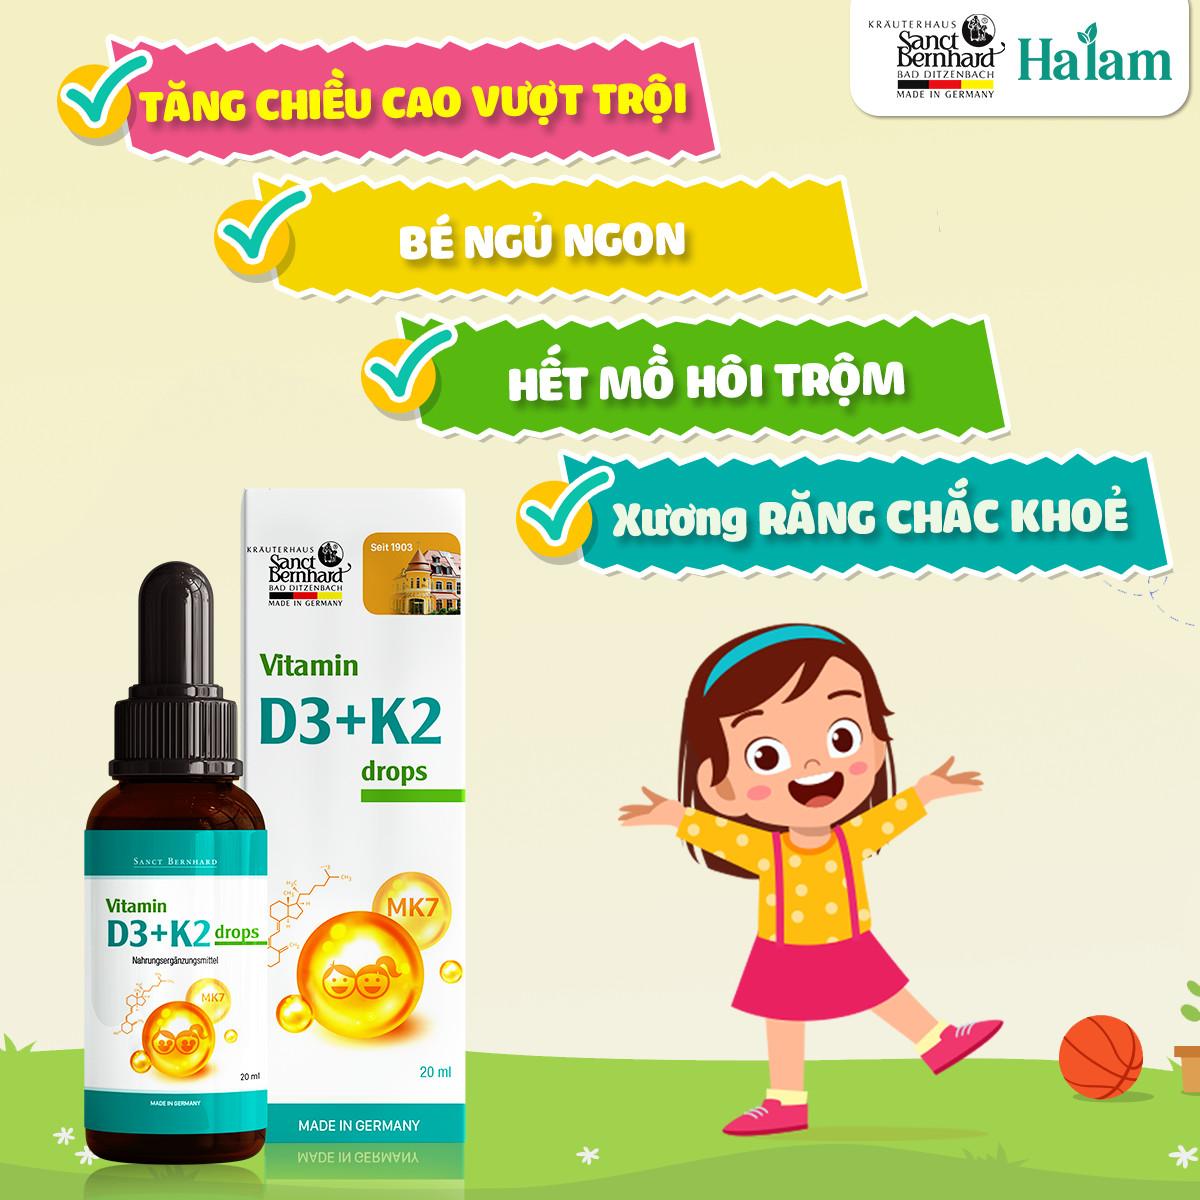 bo sung vitamin d3k2 cho be